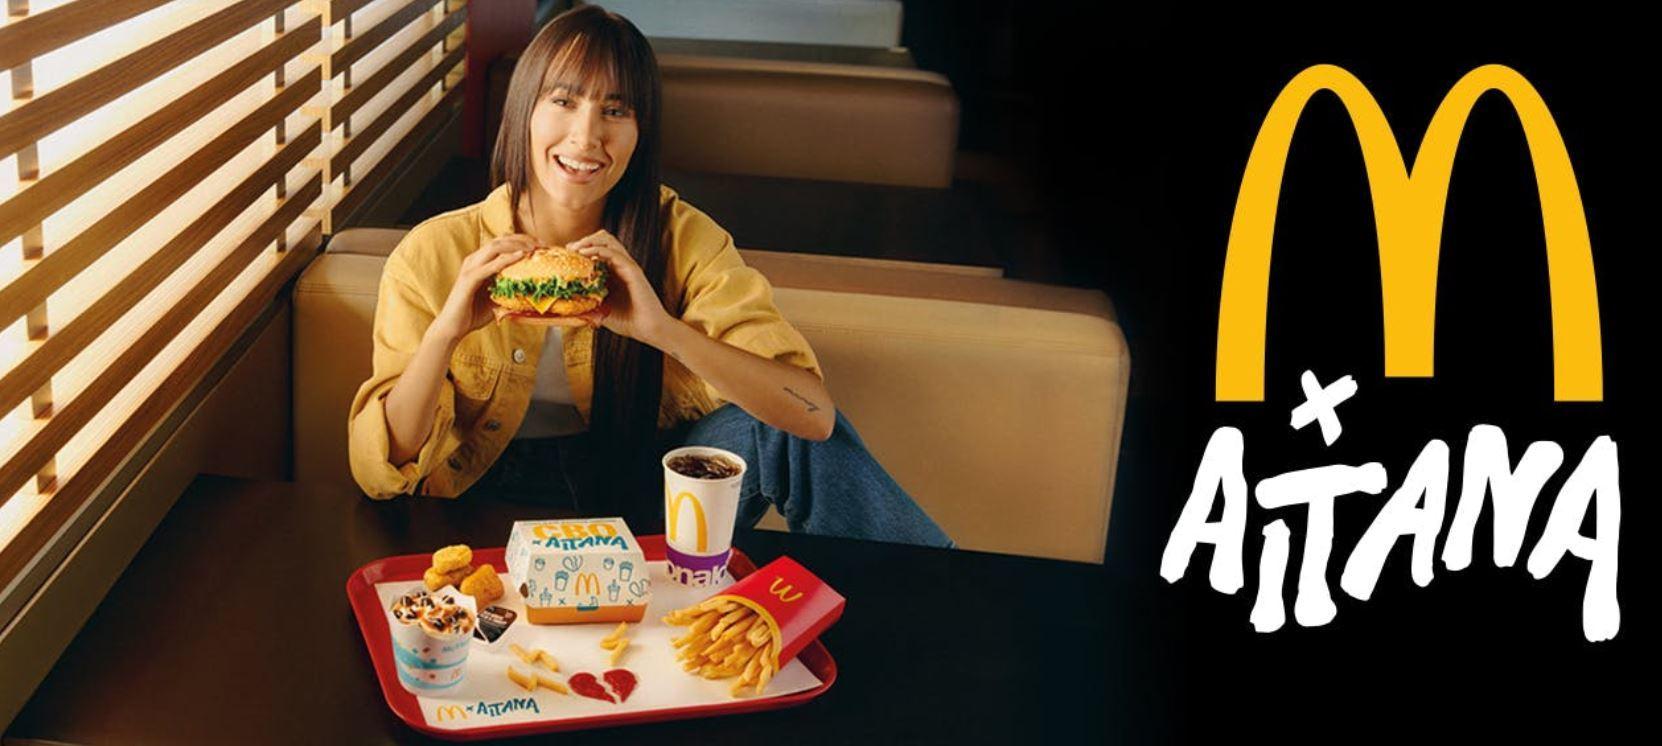 Aitana, con su menú de McDonald's